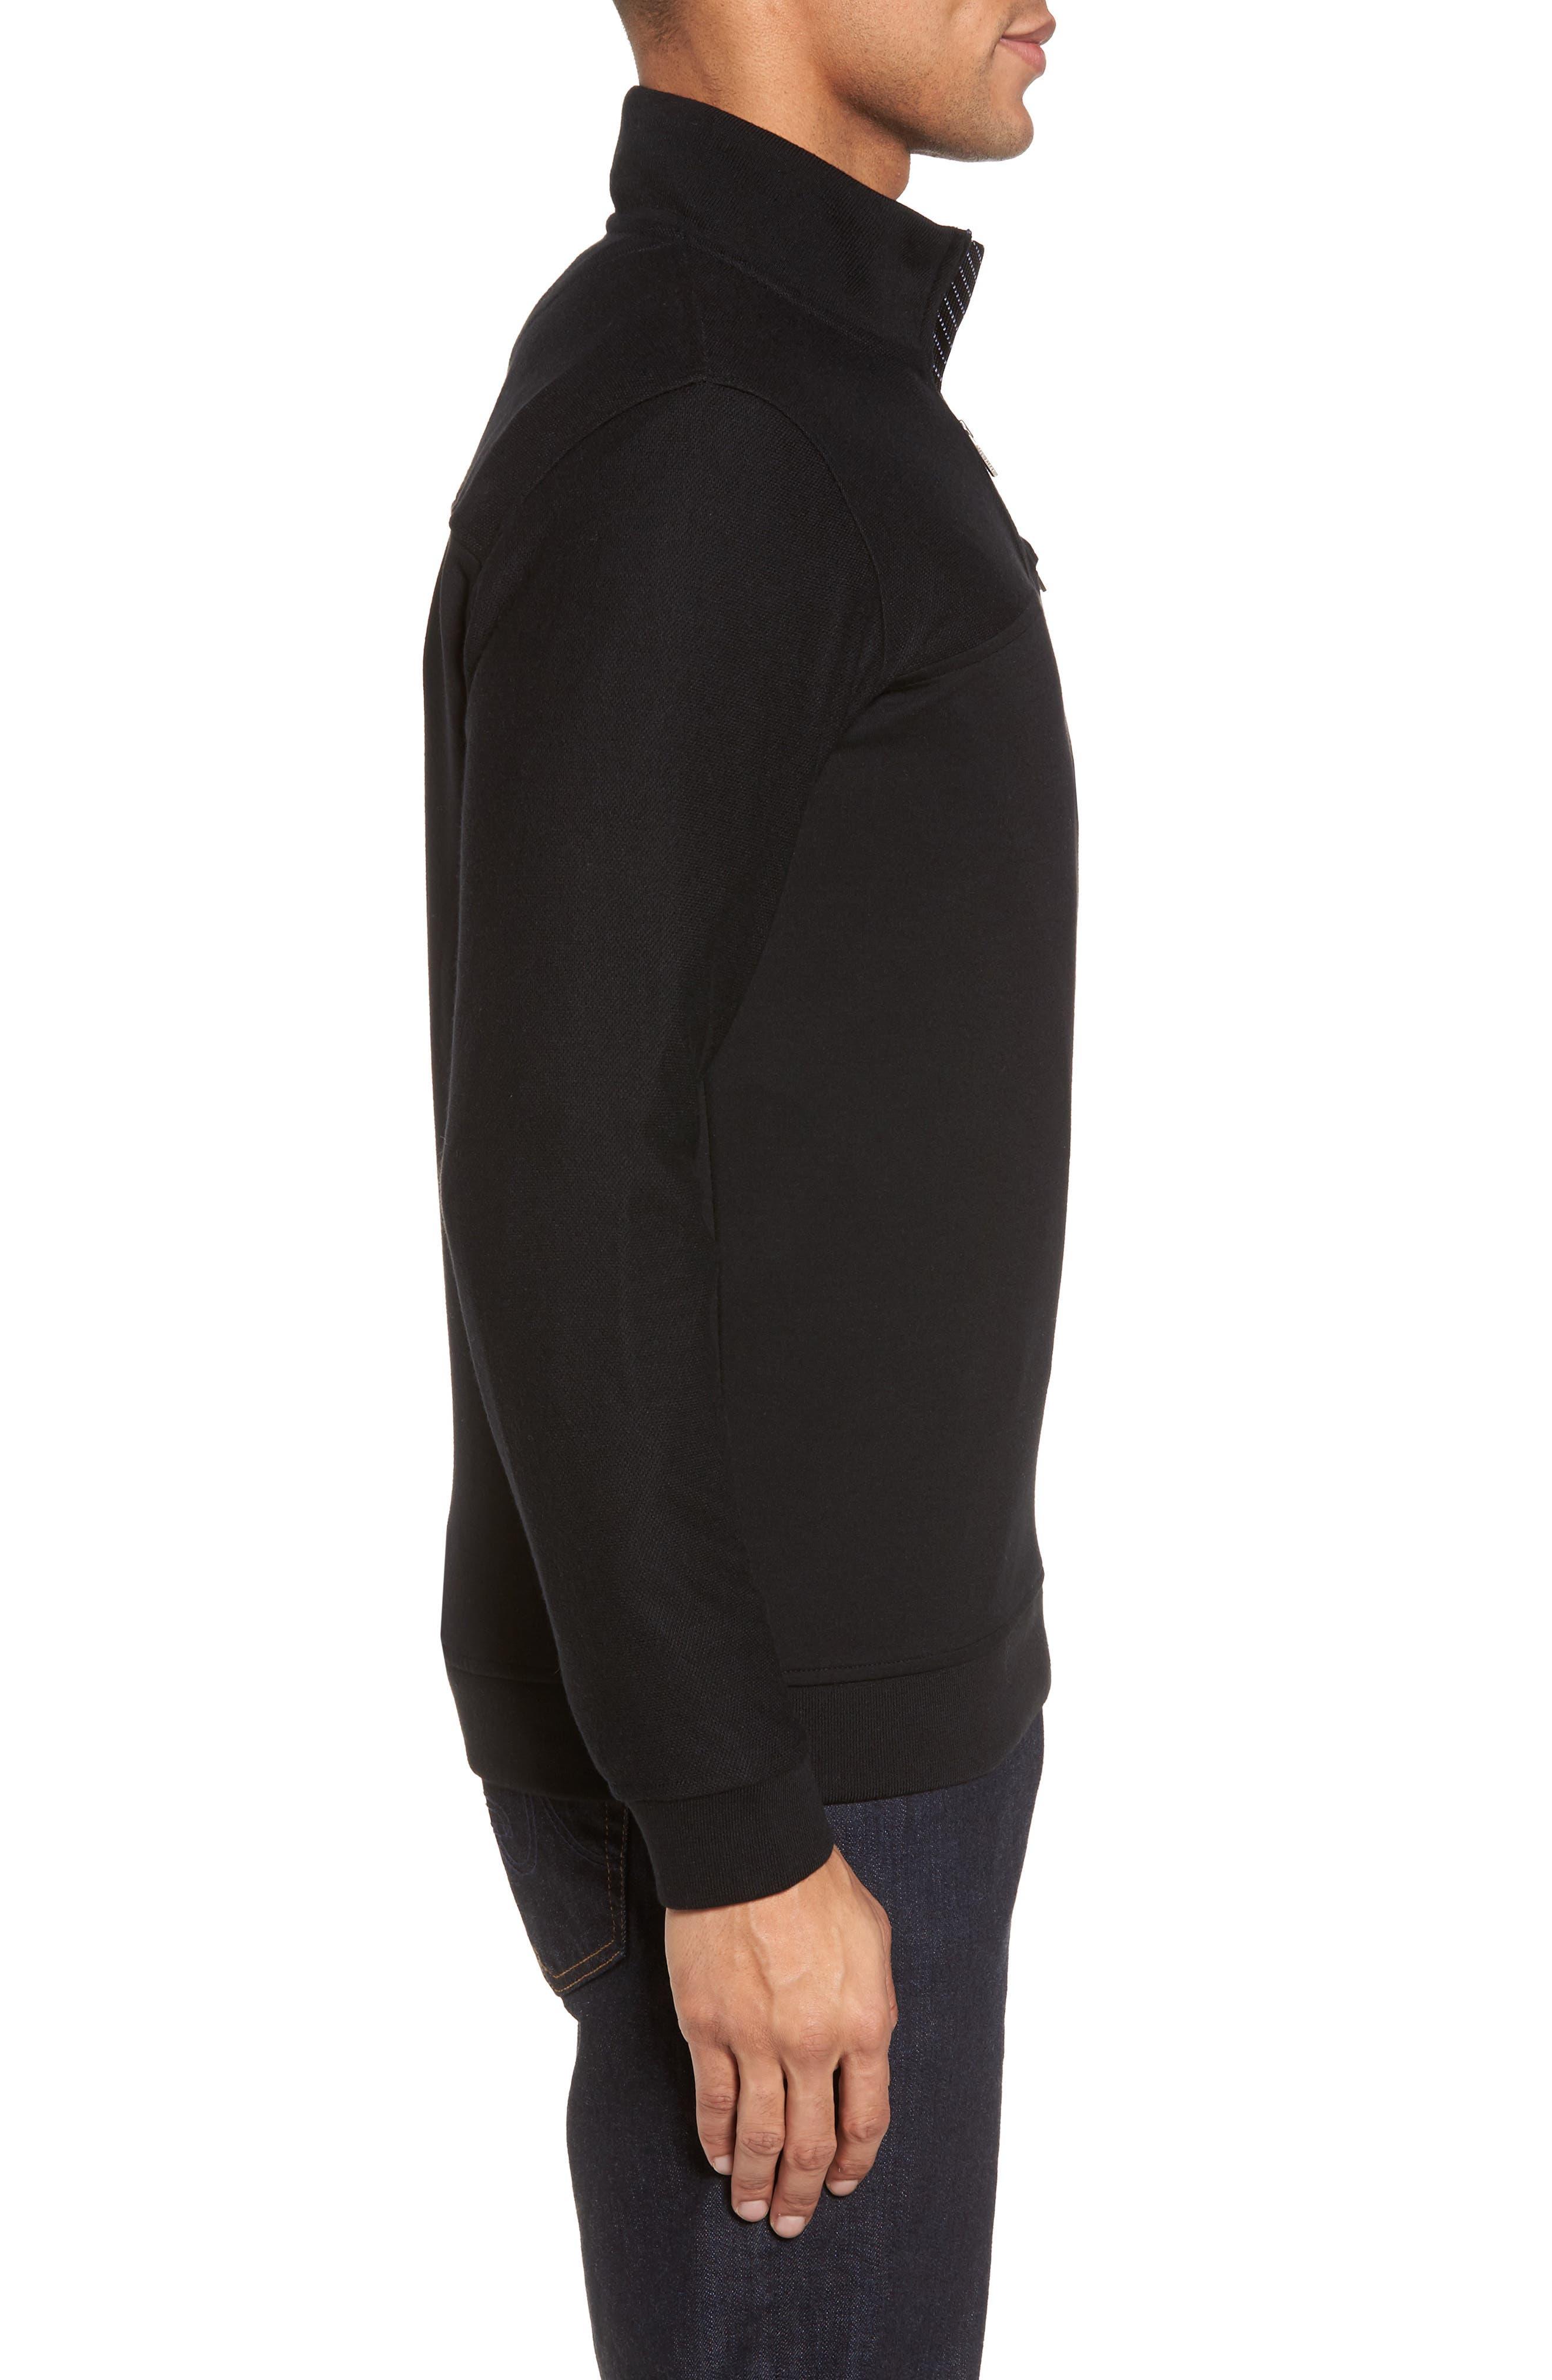 Livstay Slim Fit Quarter Zip Pullover,                             Alternate thumbnail 3, color,                             001